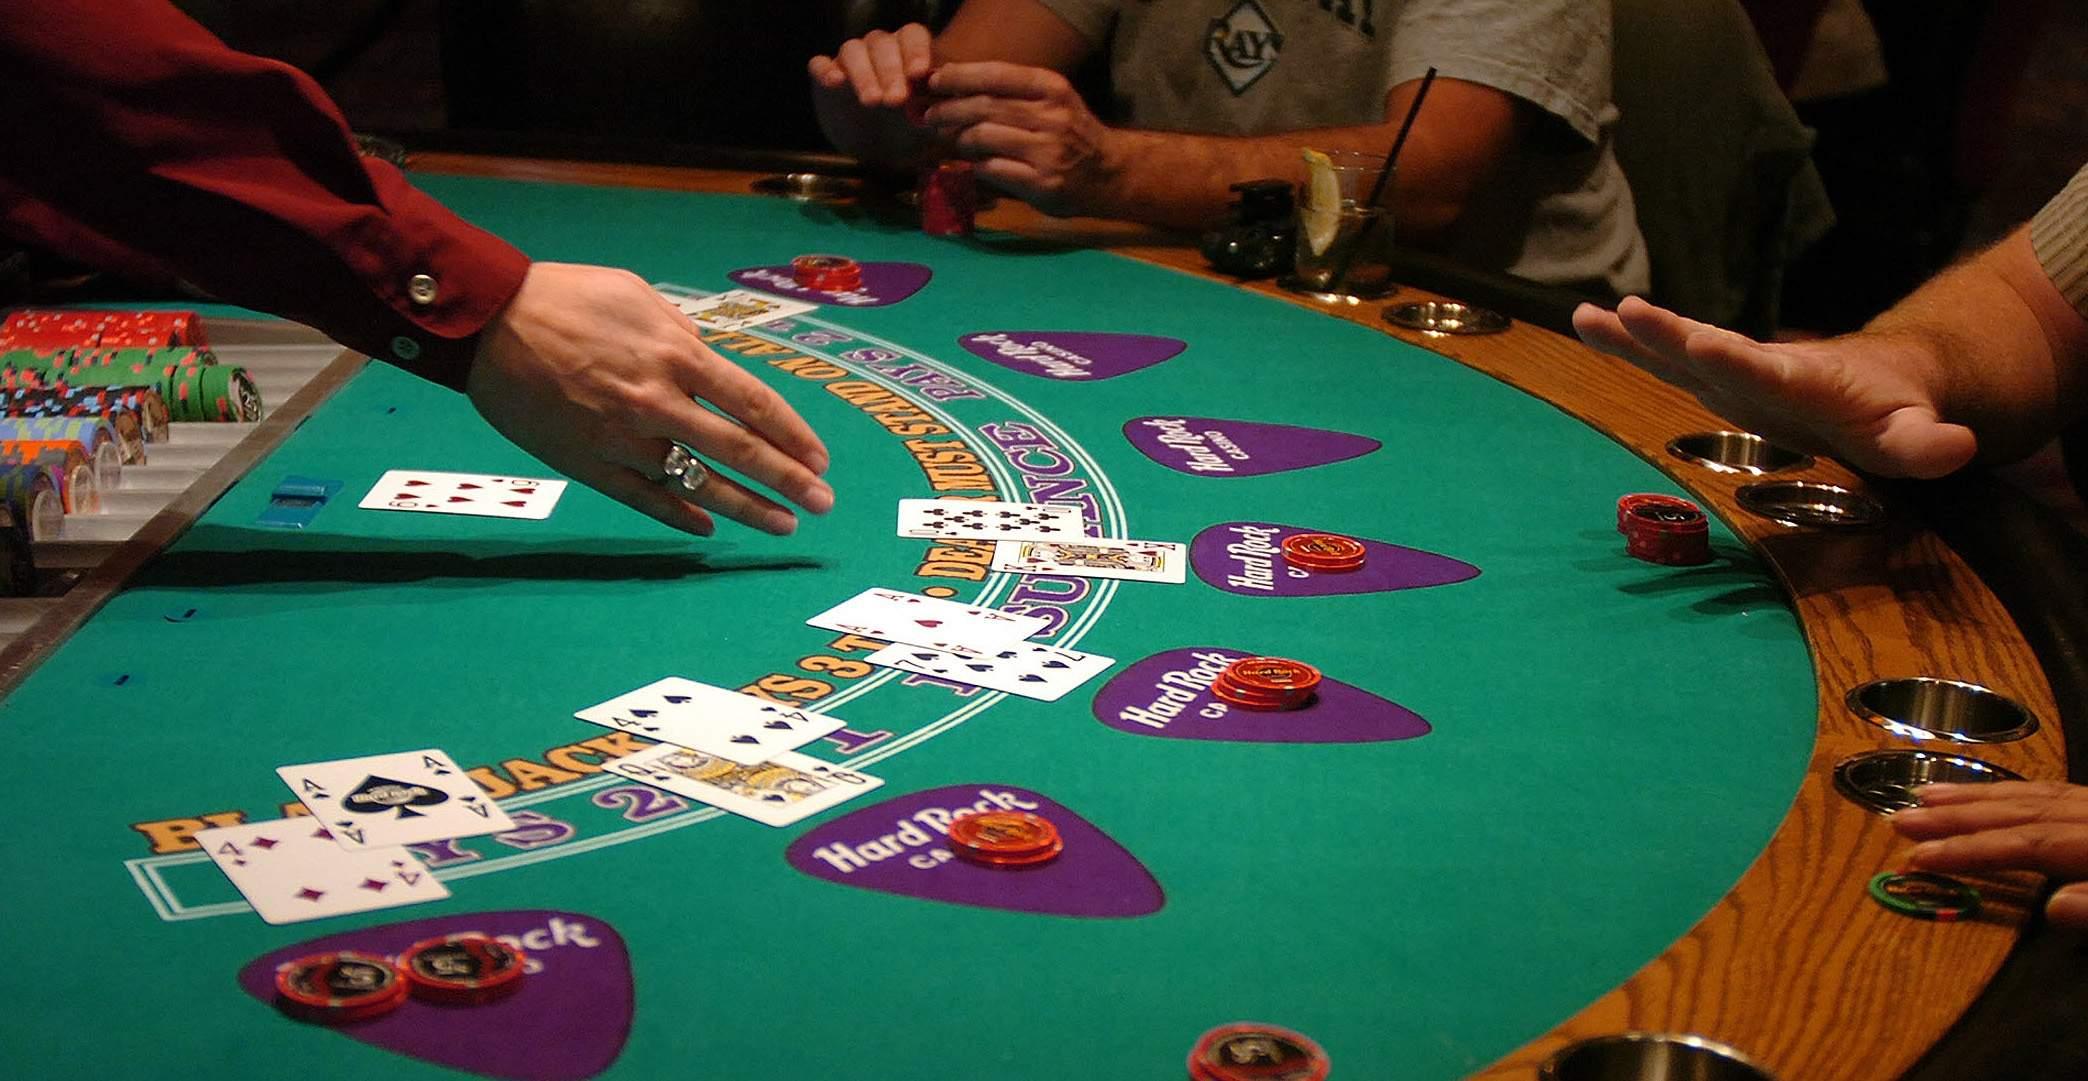 imagescasino-blackjack-50.jpg